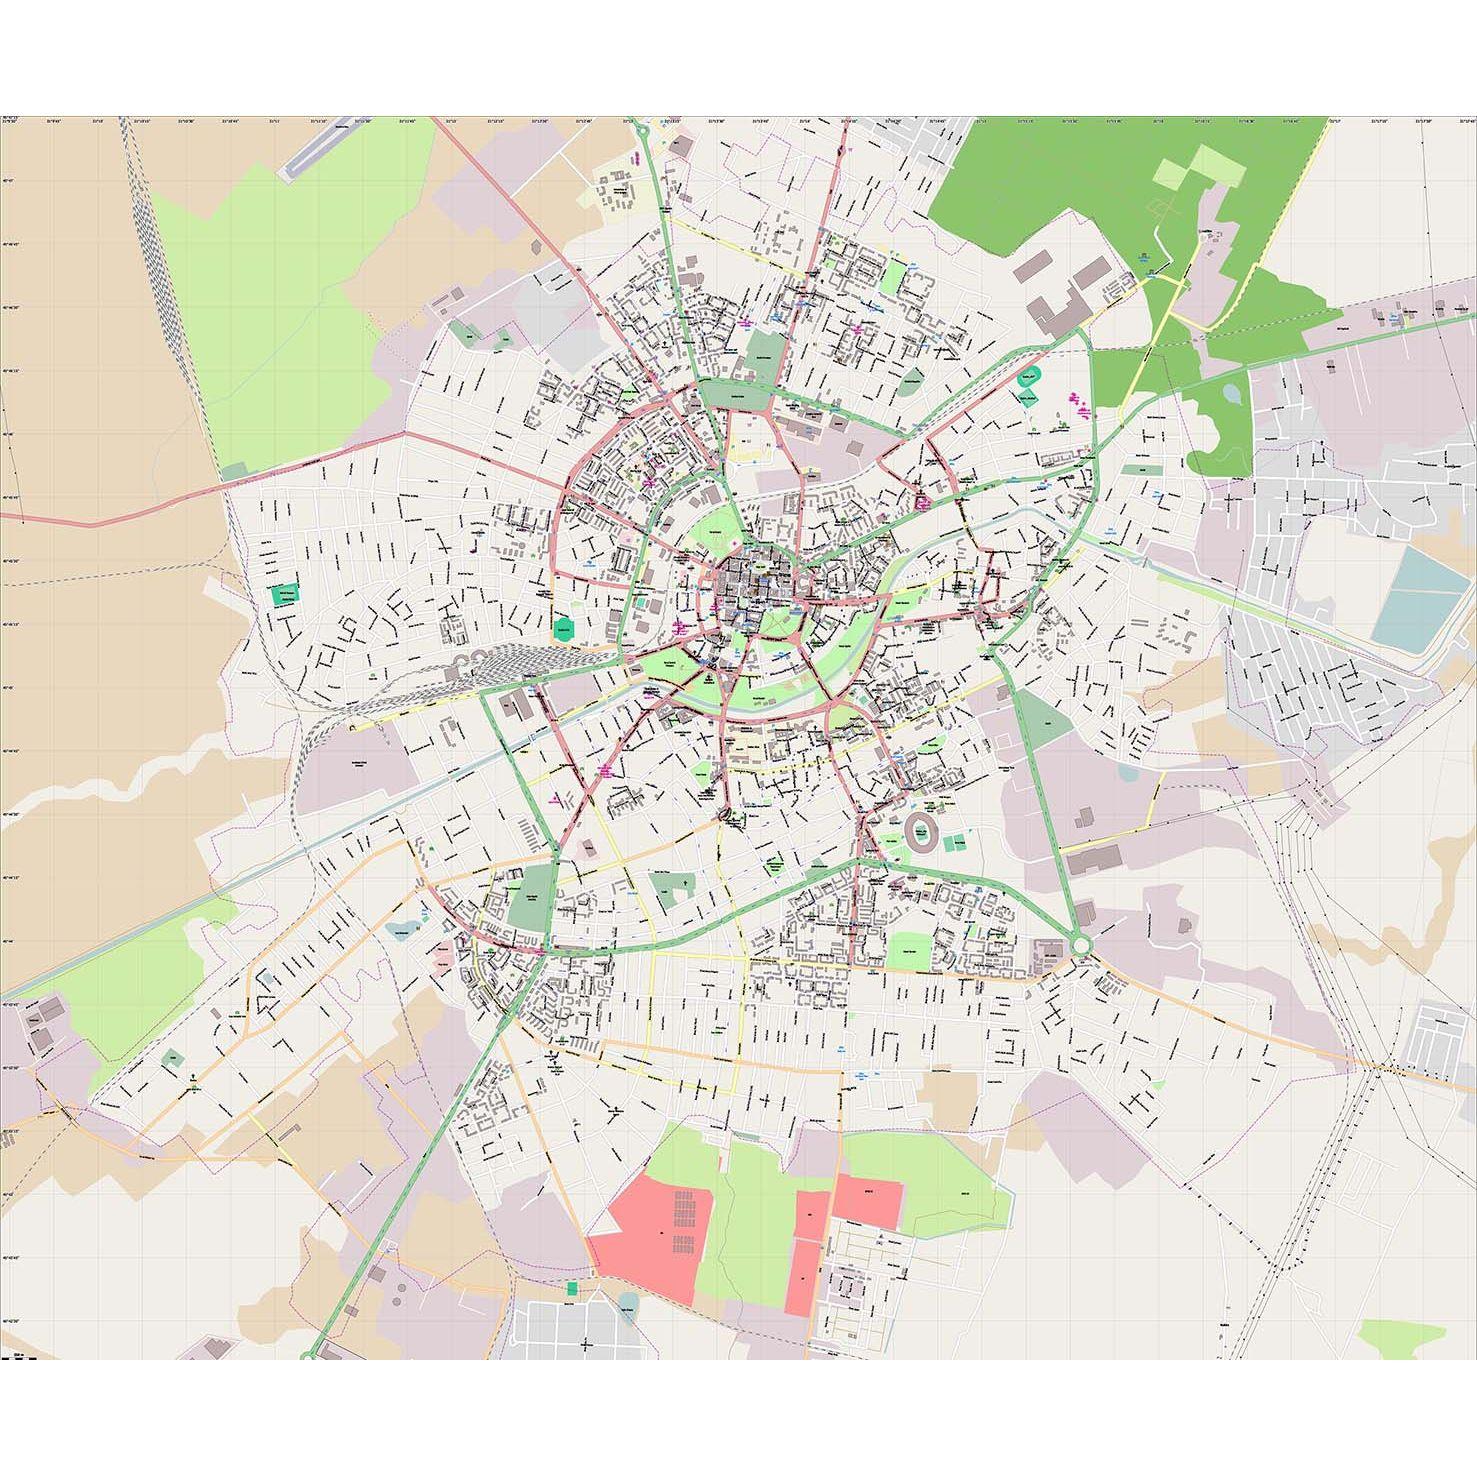 Timisoara Harta Plan De Perete Rutiera Administrativa